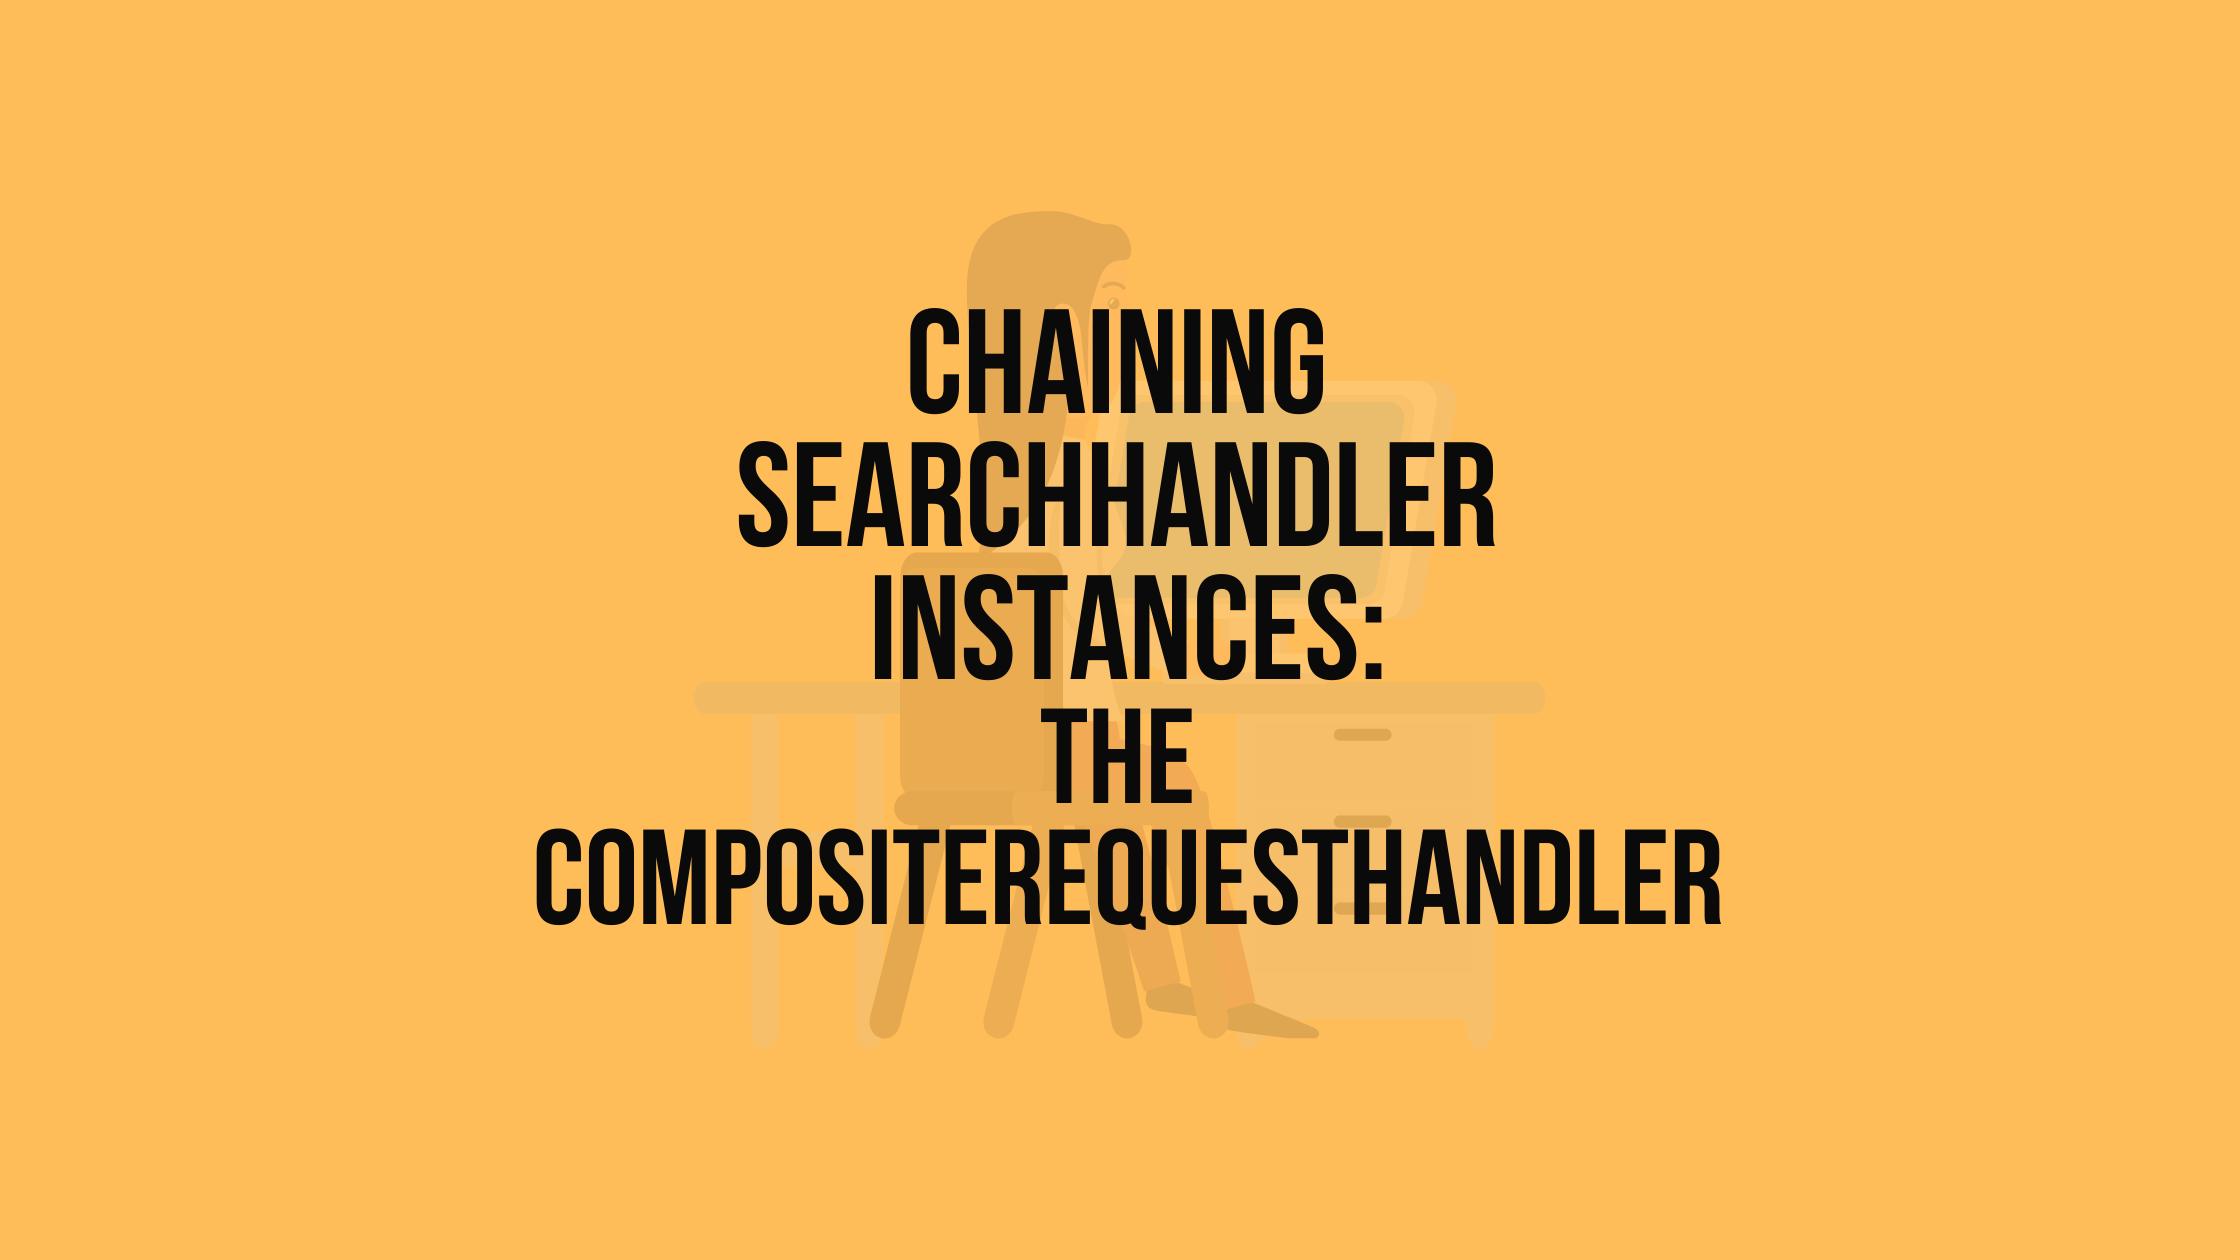 CompositeRequestHandler